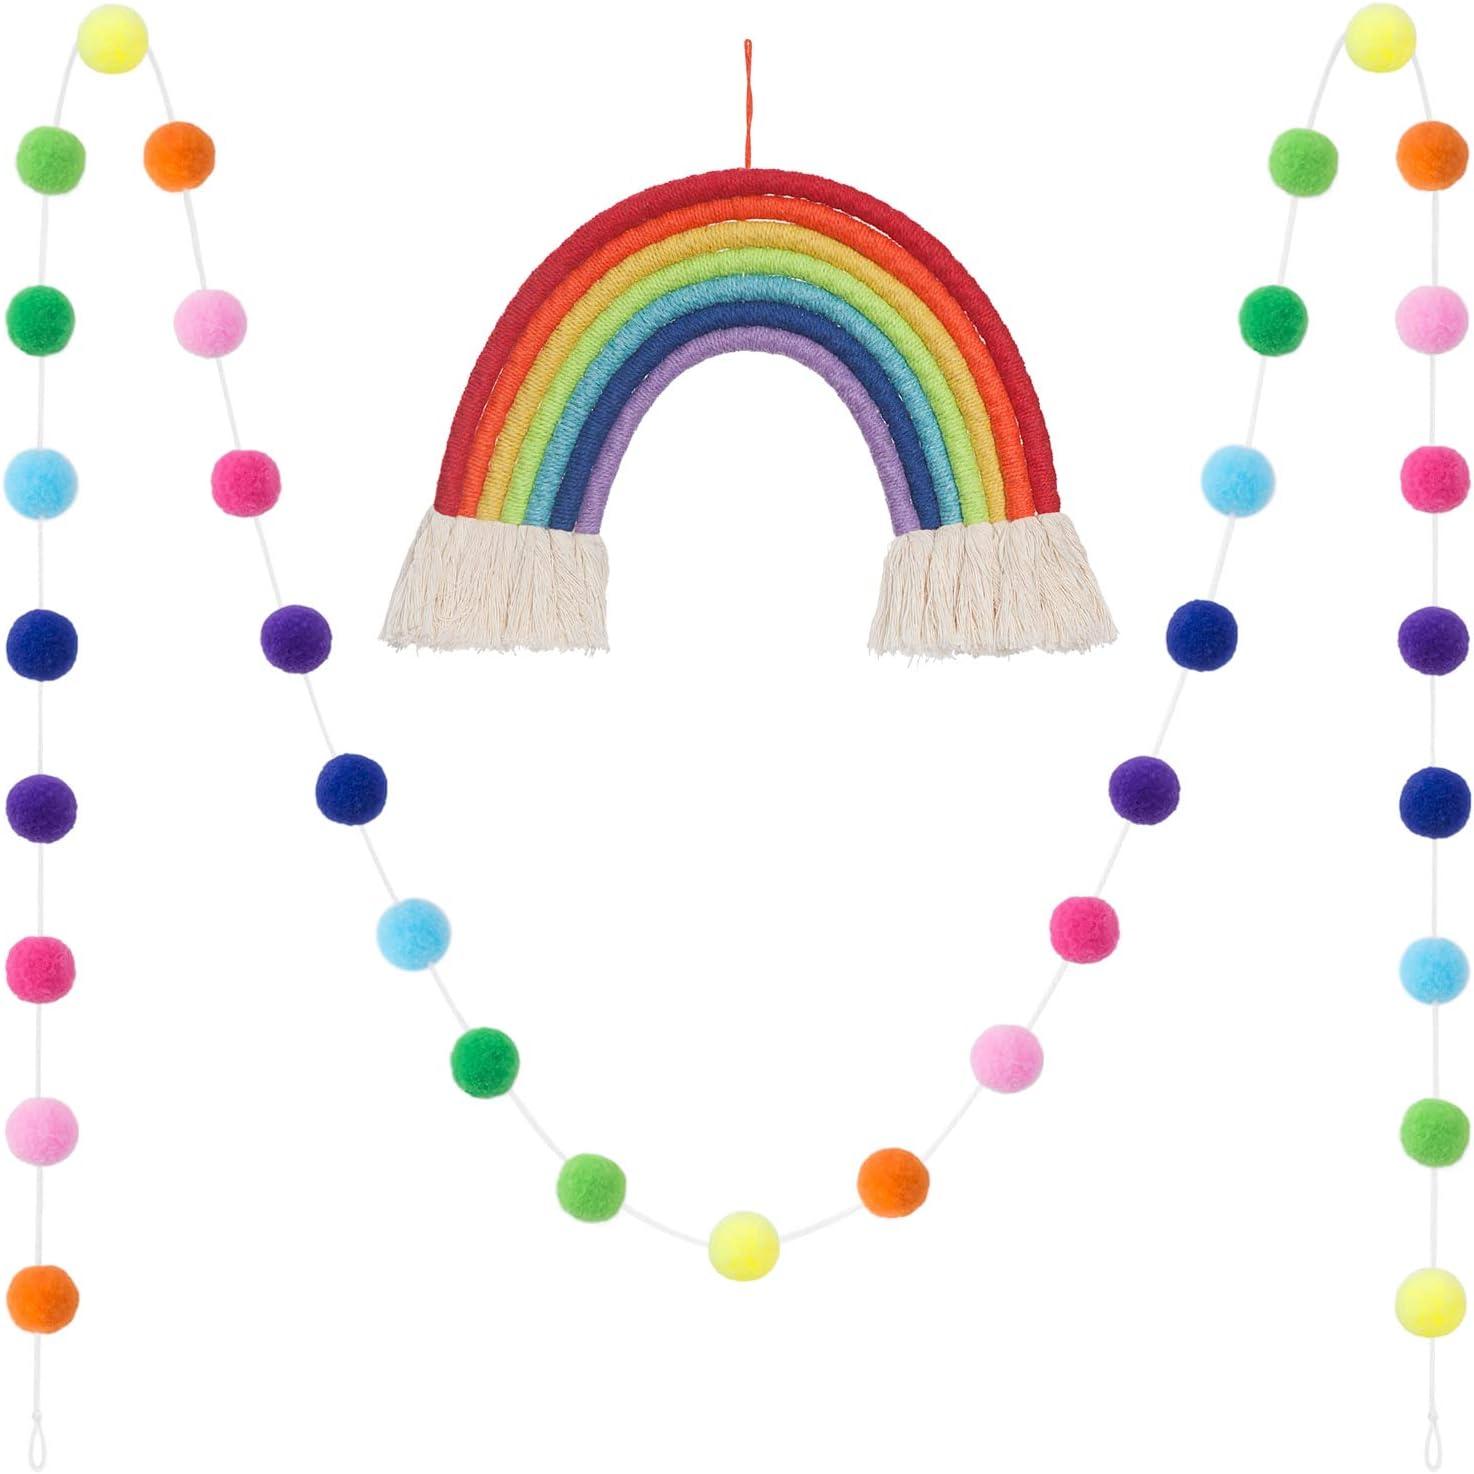 Mkono 2 Pack Christmas Tassel Garland Pom Pom Ball String Banner Macrame Rainbow Wall Hanging Decorative Colored for Boho Home Decor, Xmas Tree Decorations, Party, Baby Shower, Nursey Dorm Room